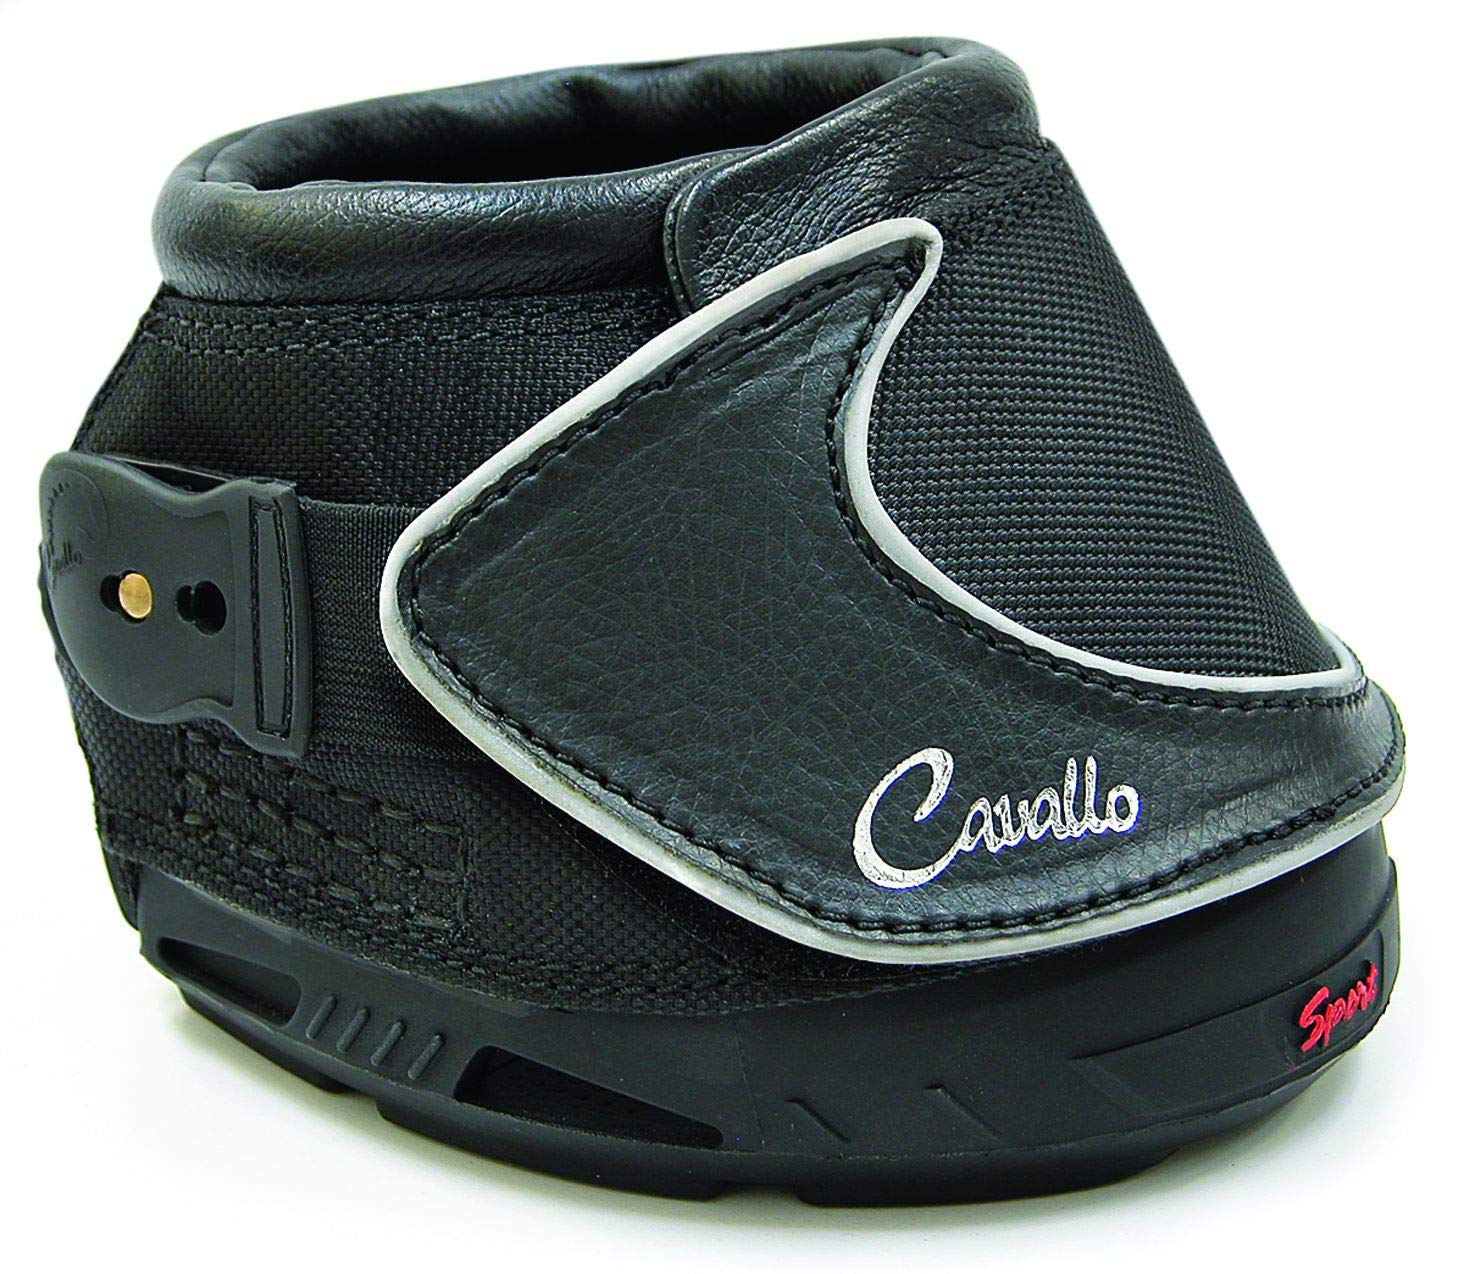 Cavallo Horse & Rider Sport Regular Sole Hoof Boot, Size 5